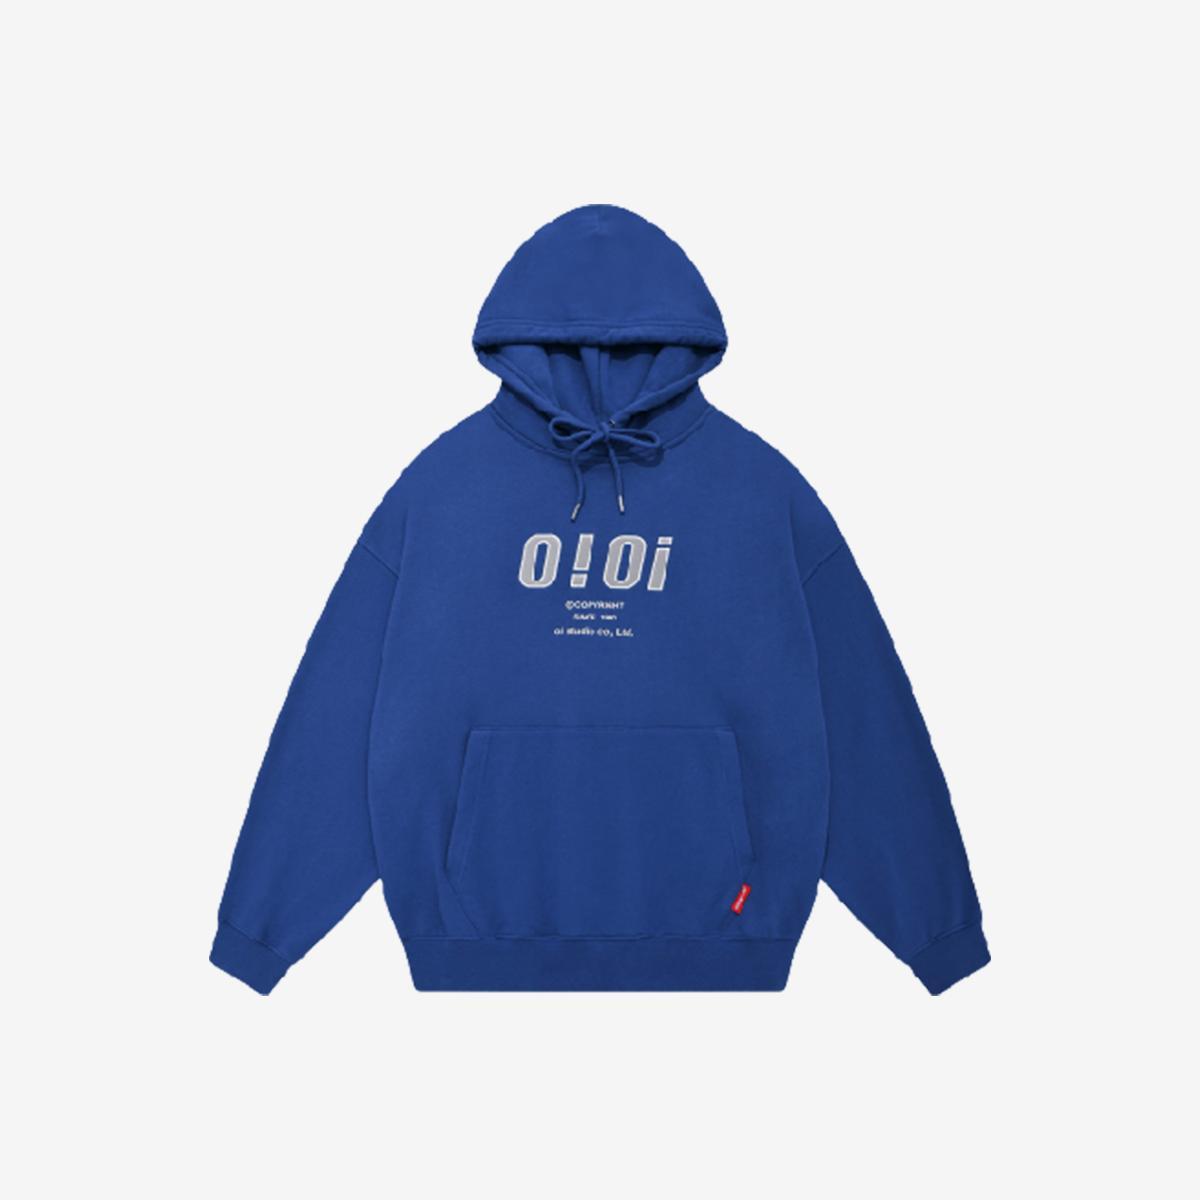 ⟪河成雲同款⟫ 2020 Signature 帽T(藍色)